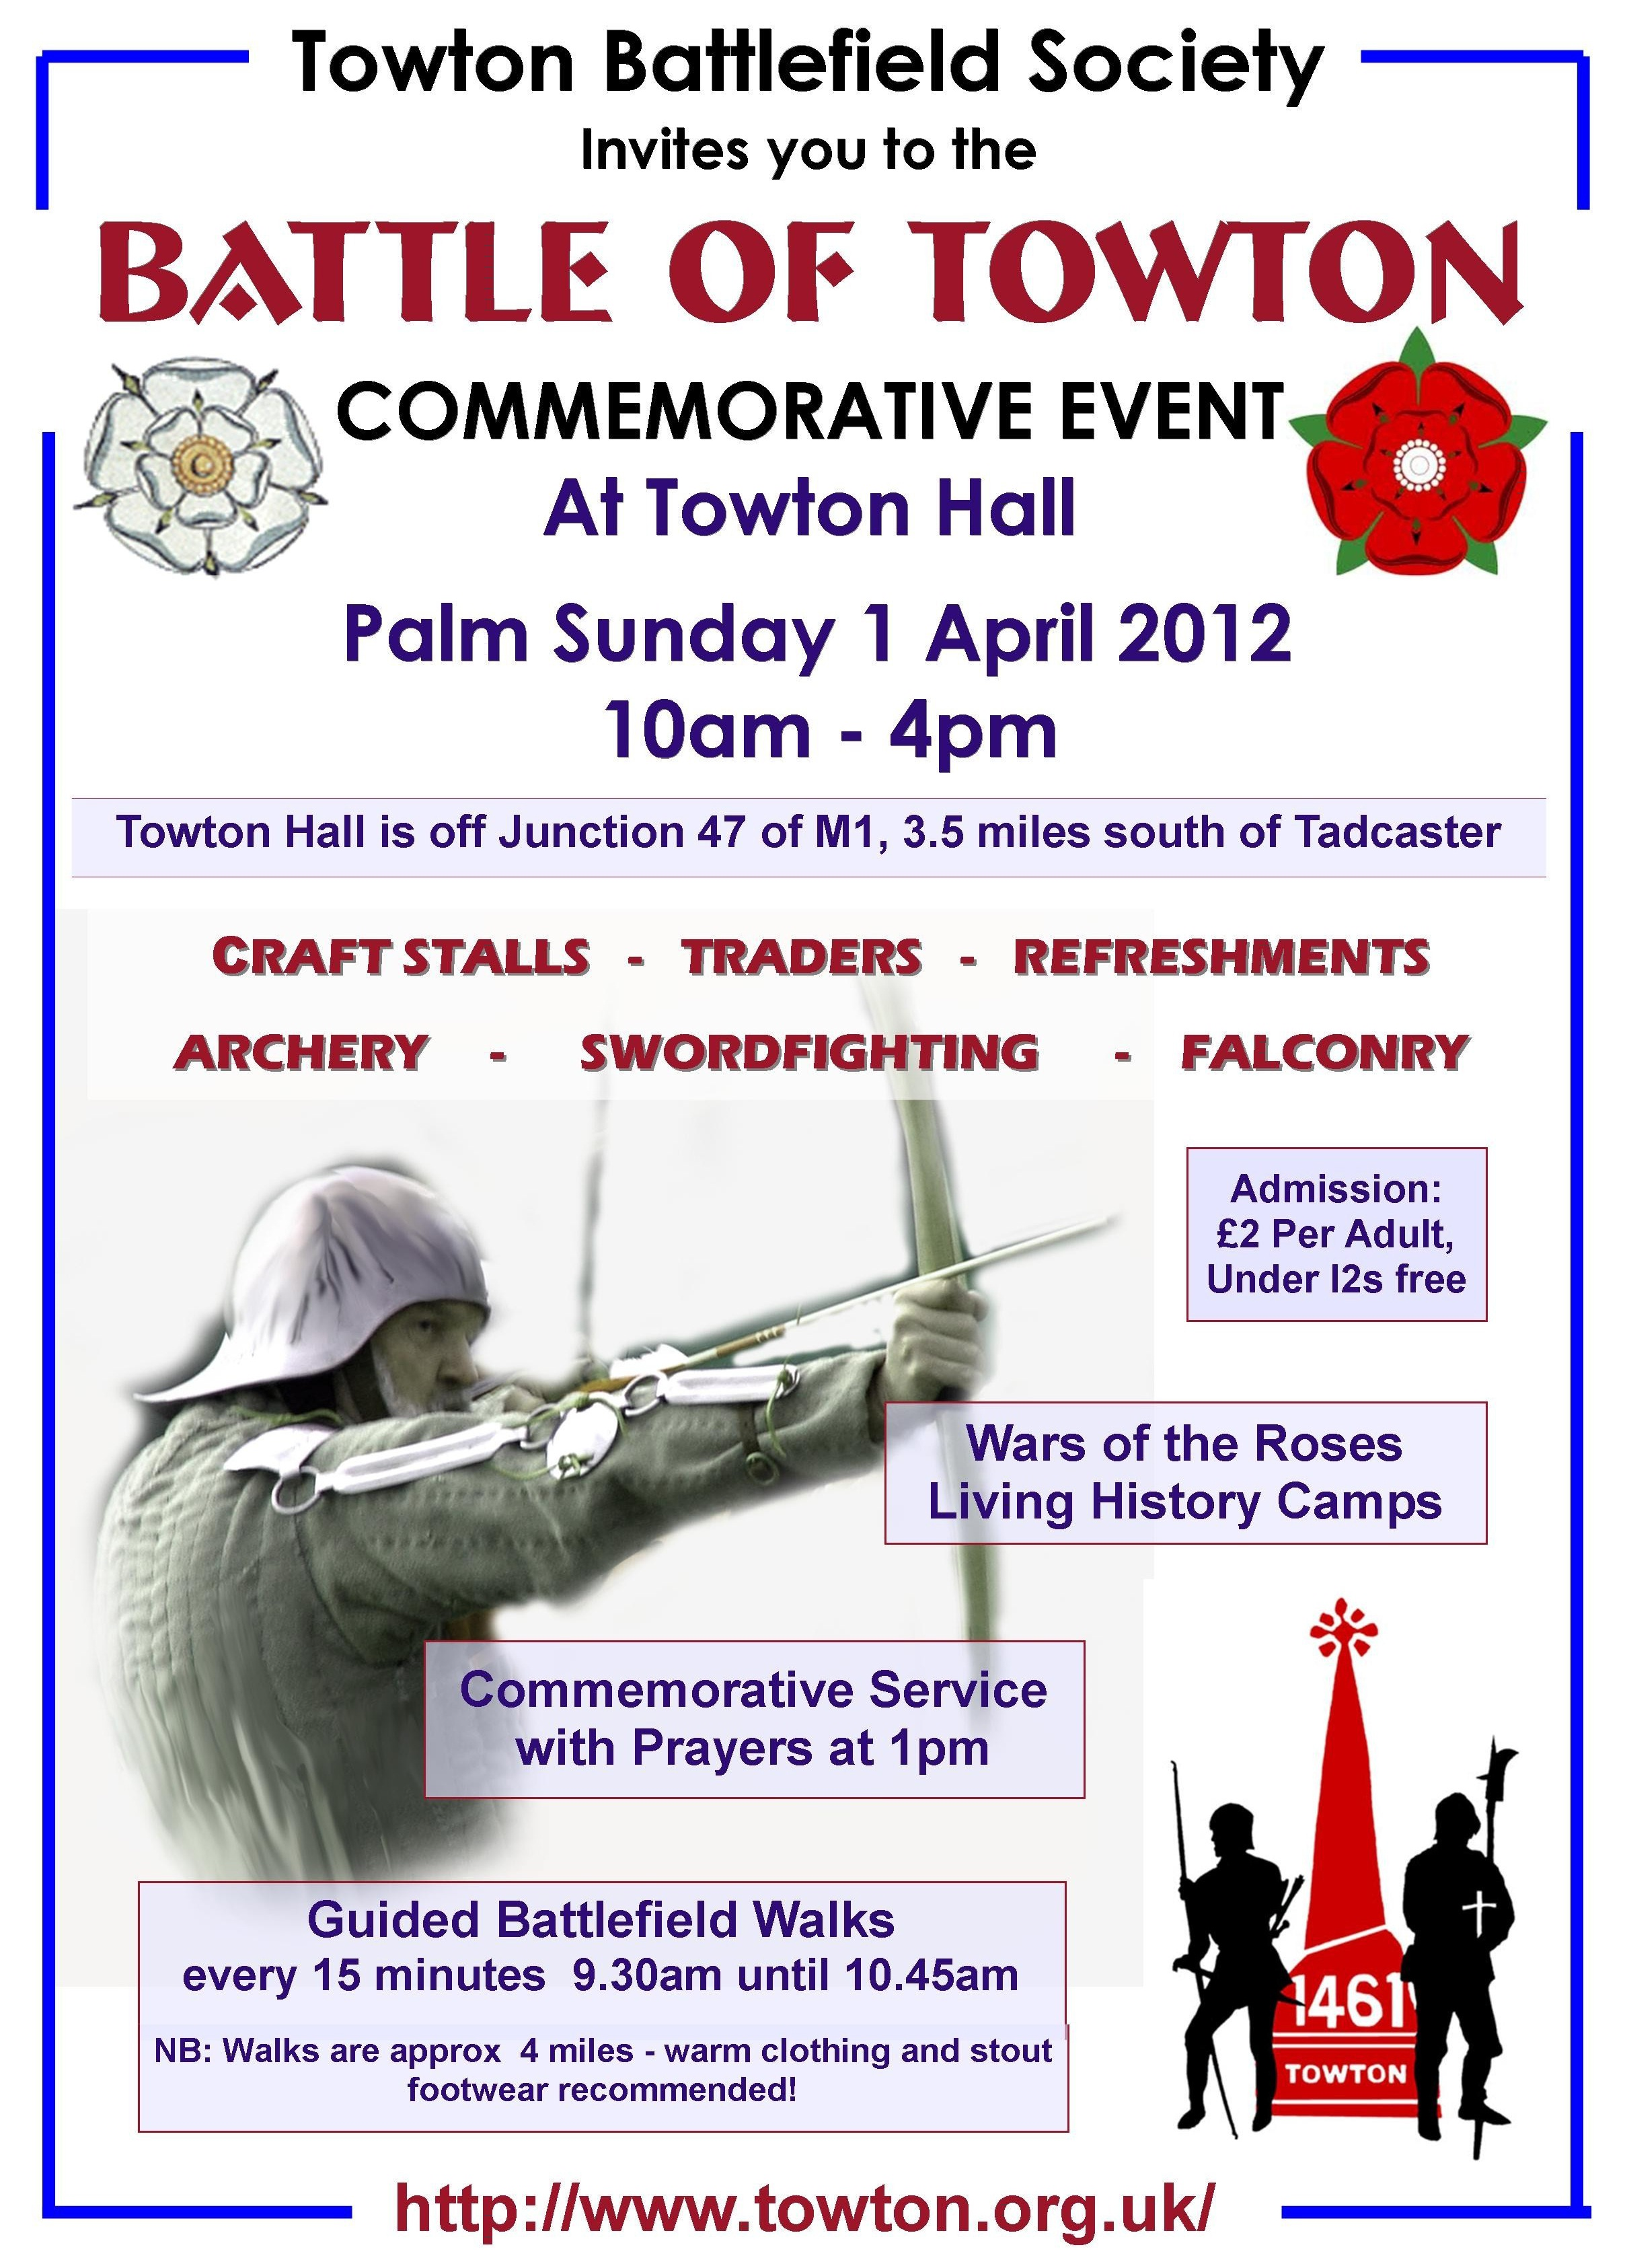 Towton Battlefield Society 2012